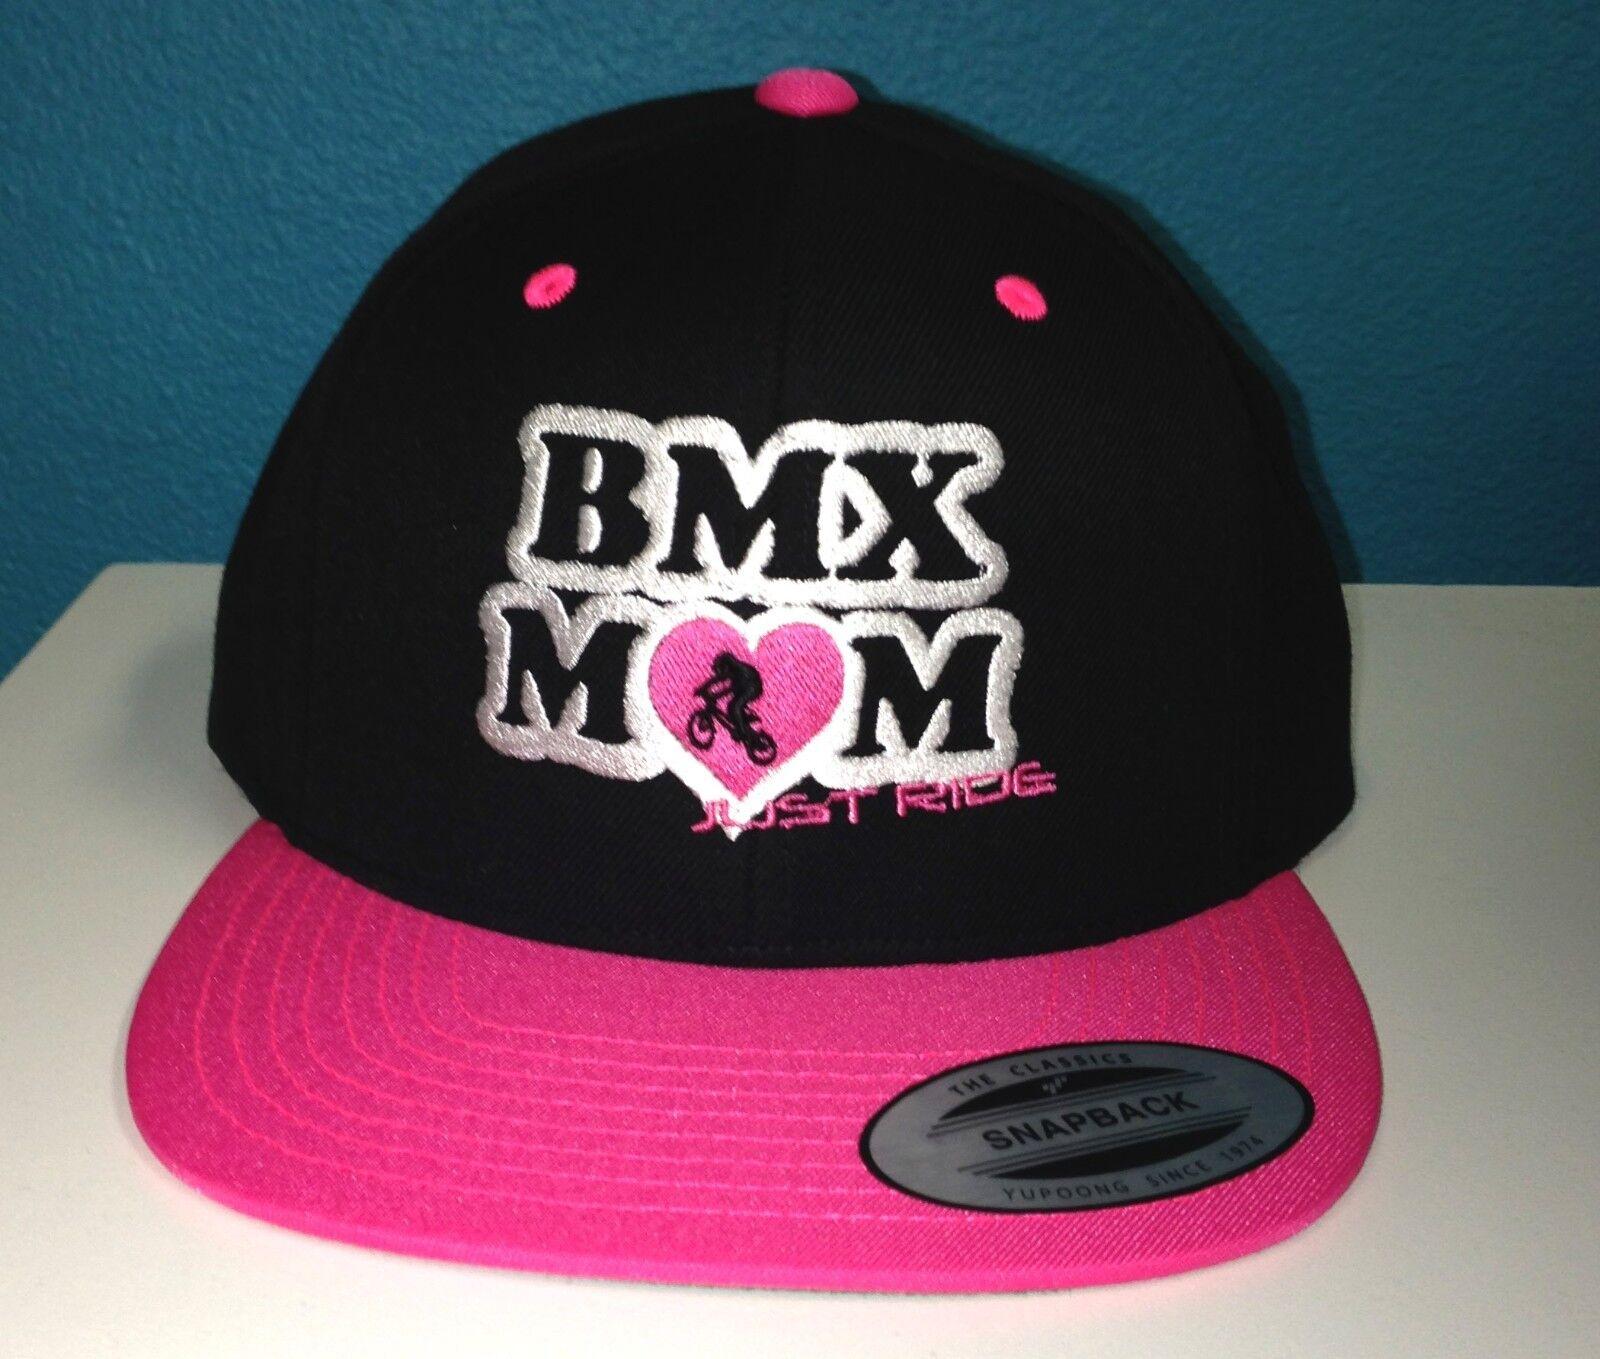 BMX Mama Mum Hut Kappe Flache Bill Snapback Nur Ride Fahrrad Rennen